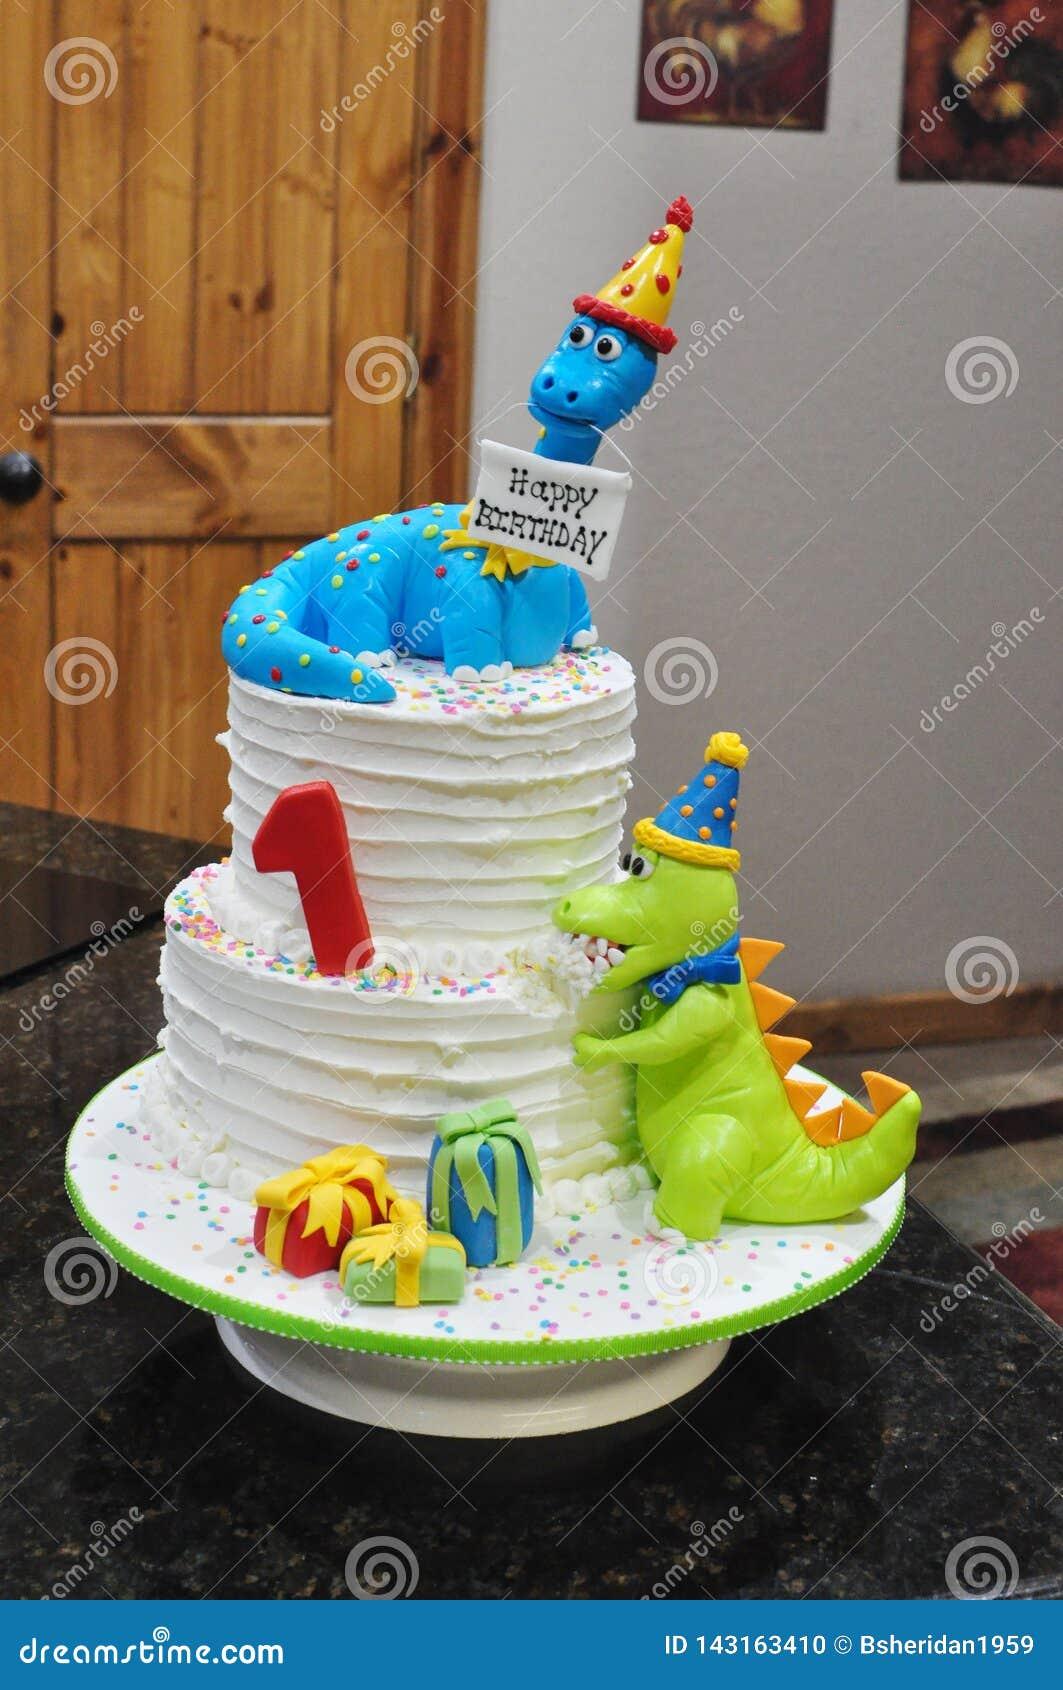 Fabulous Child S Dinosaur Birthday Cake Stock Photo Image Of Baked Personalised Birthday Cards Bromeletsinfo